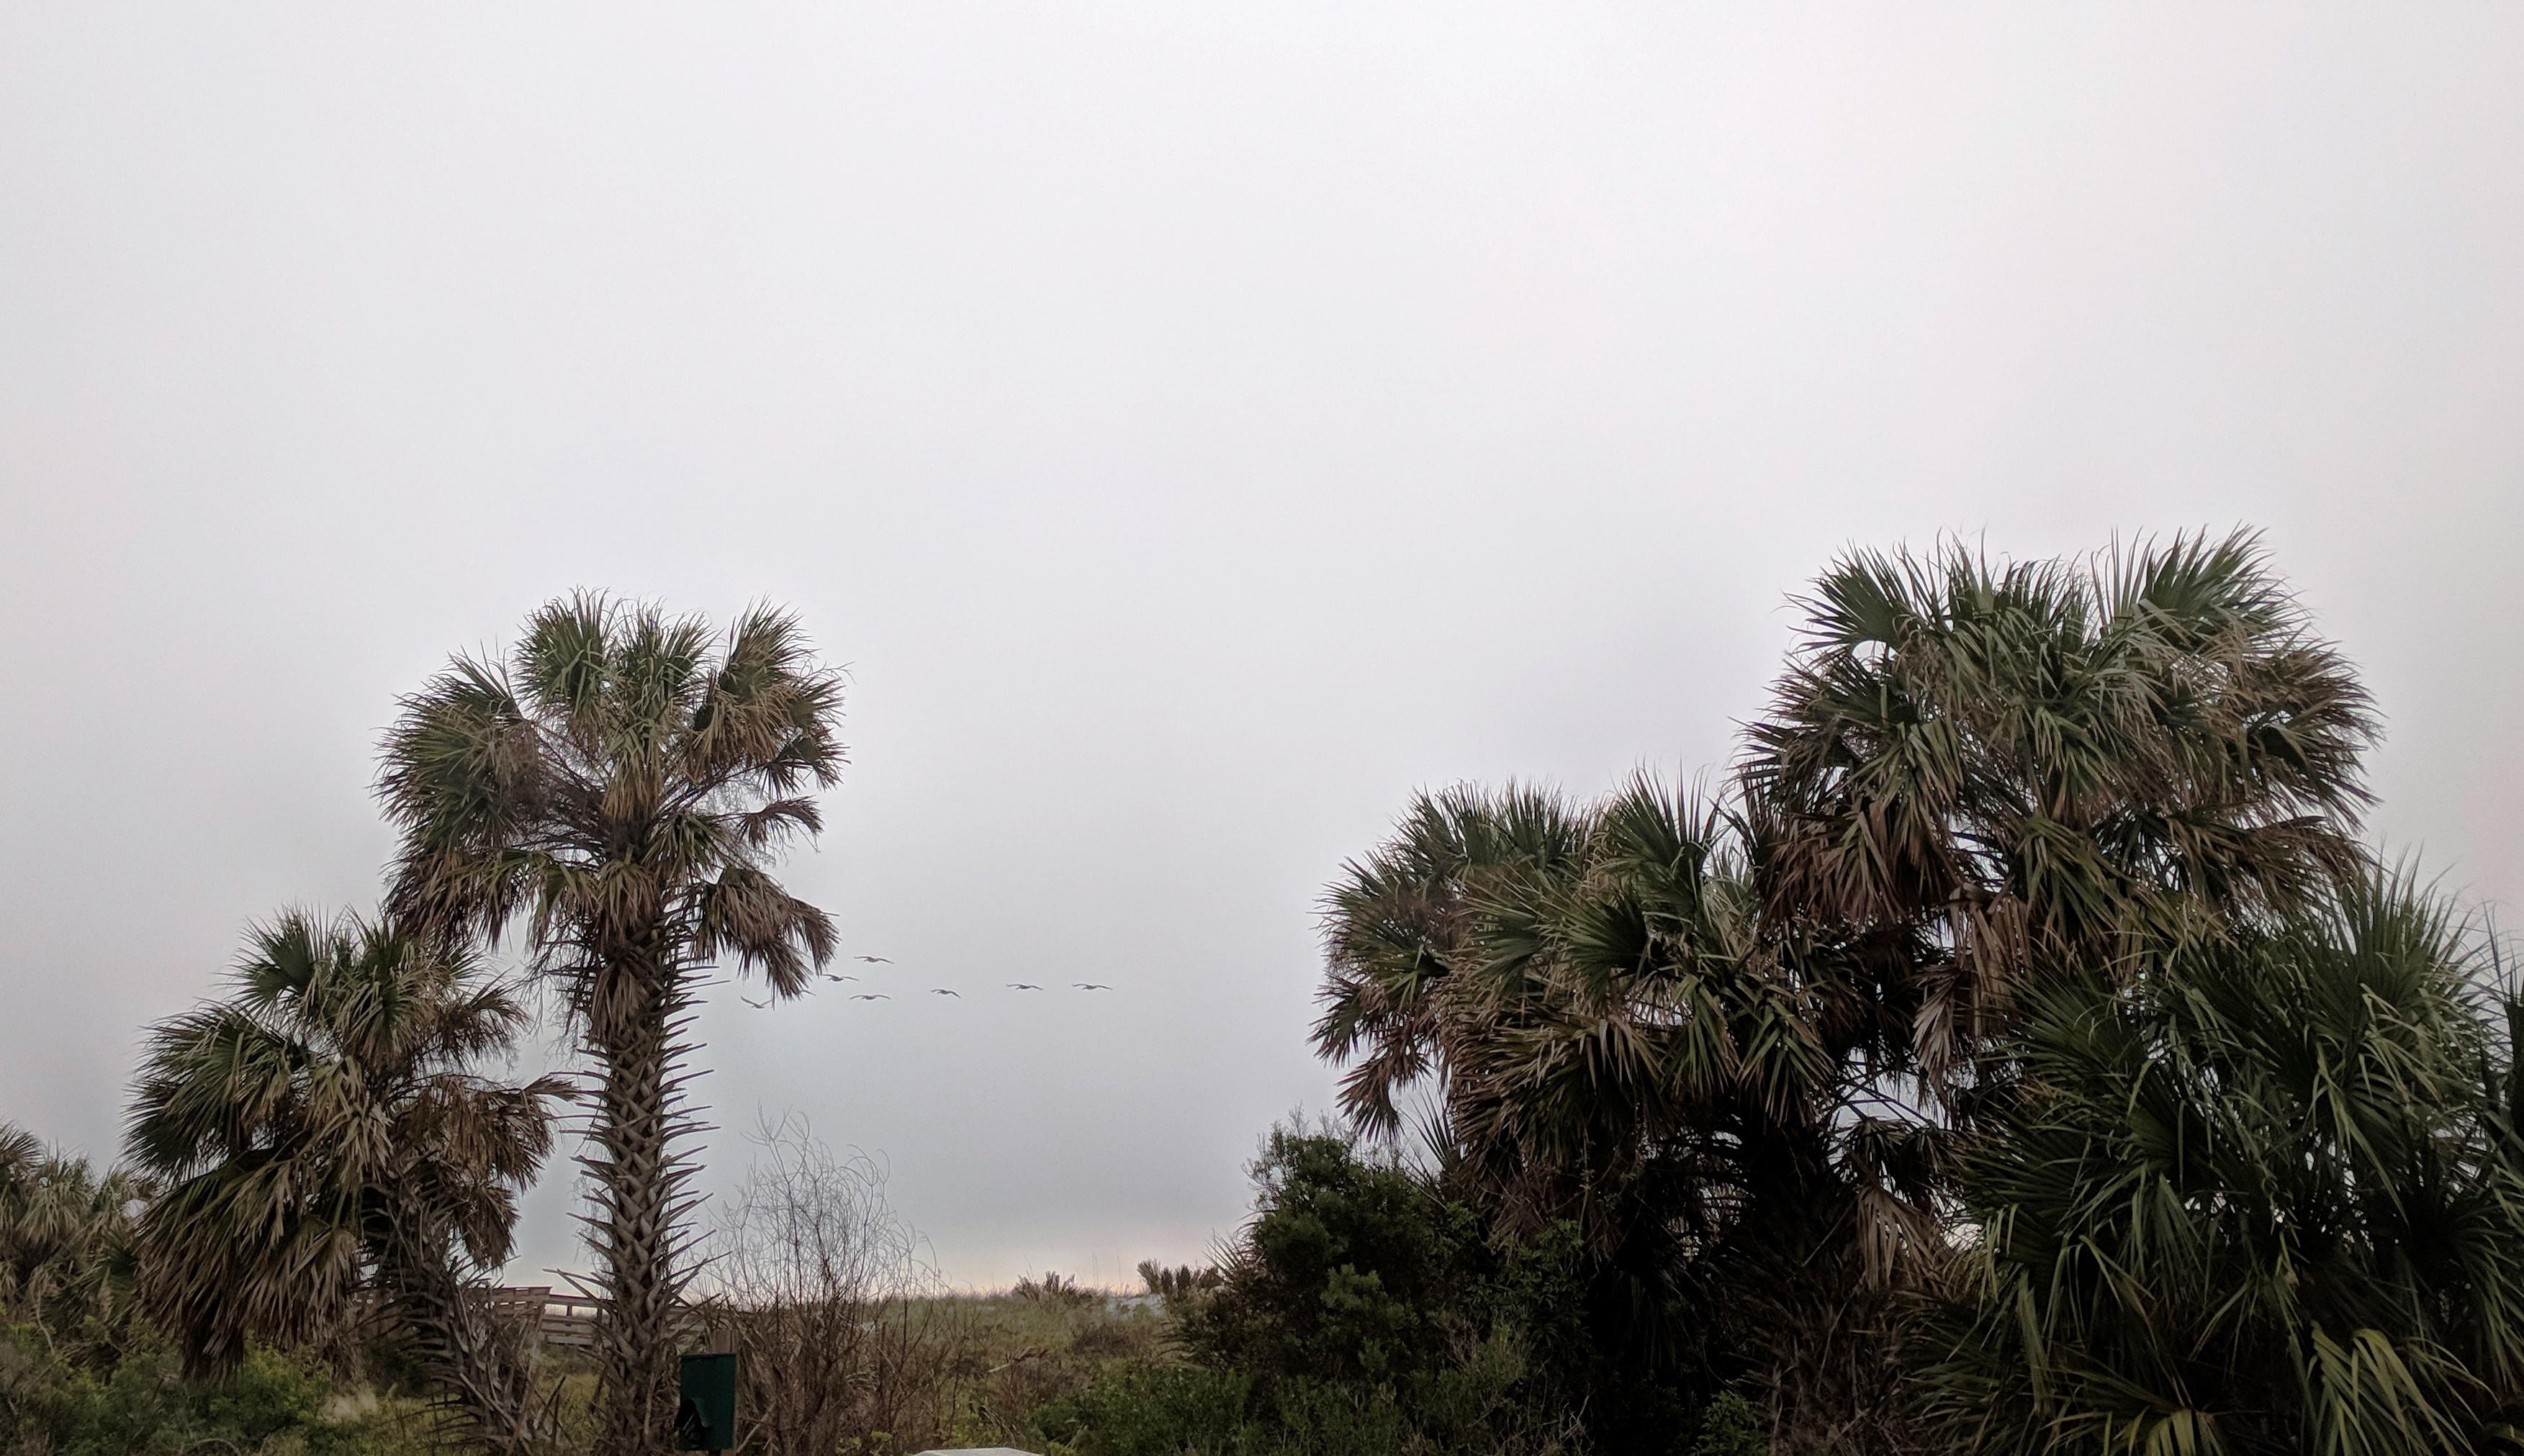 Palm trees, resort